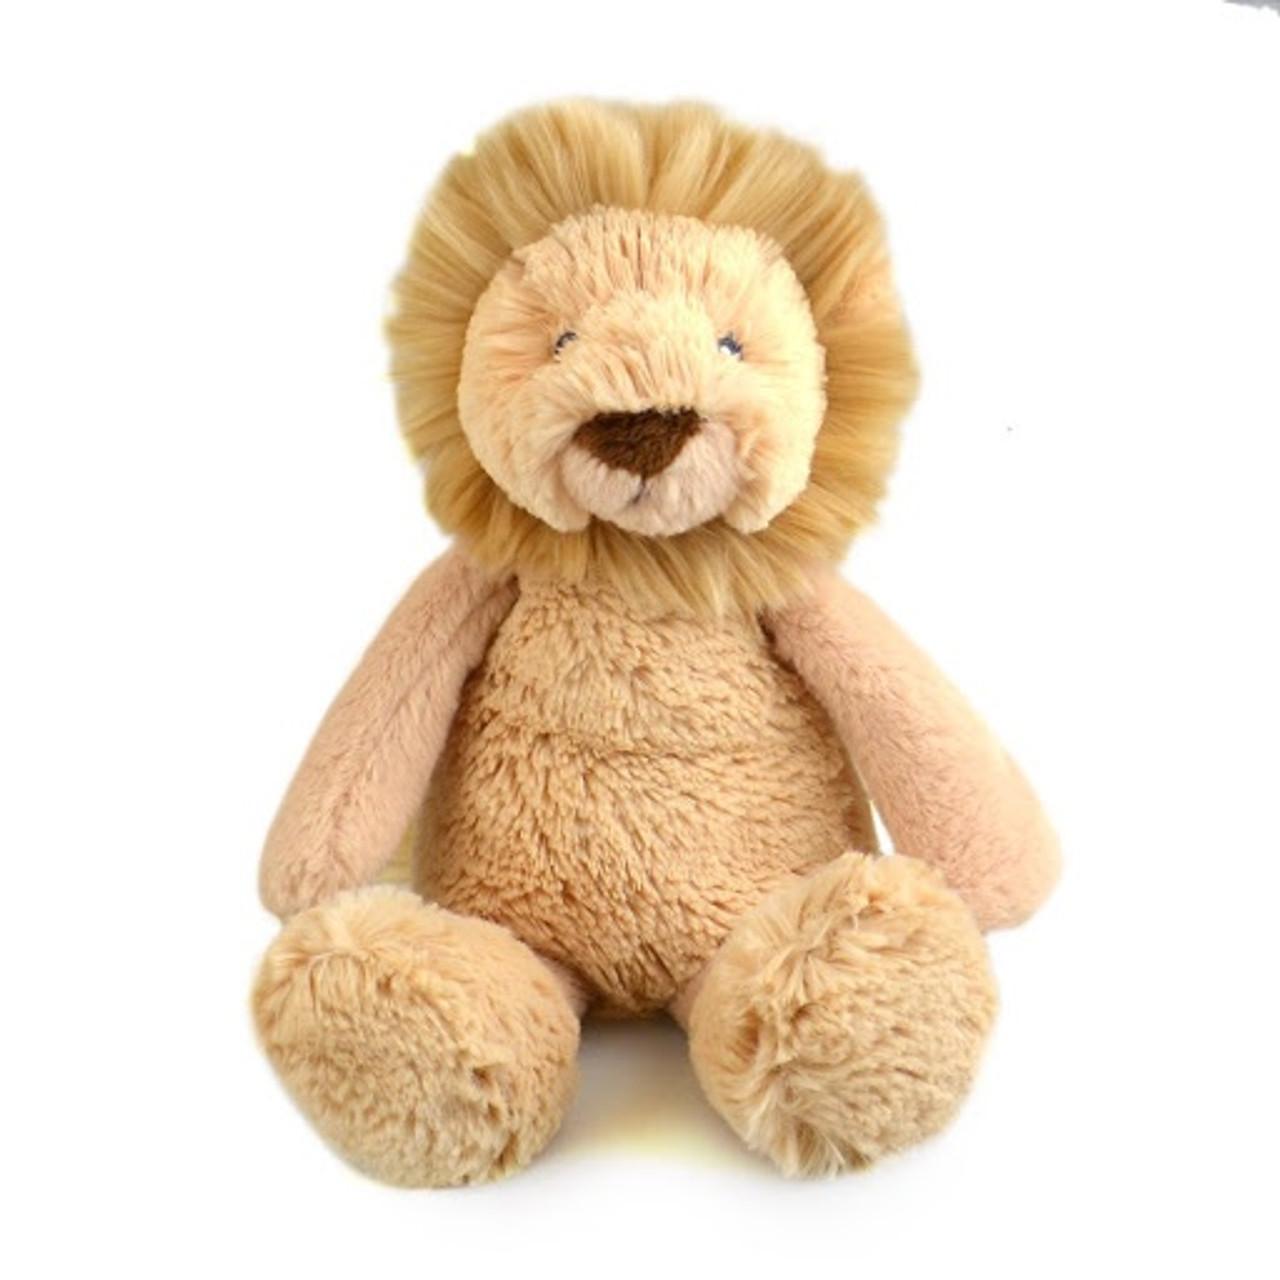 Korimco Frankie and Friends Plush Toy 28 cm - Lion